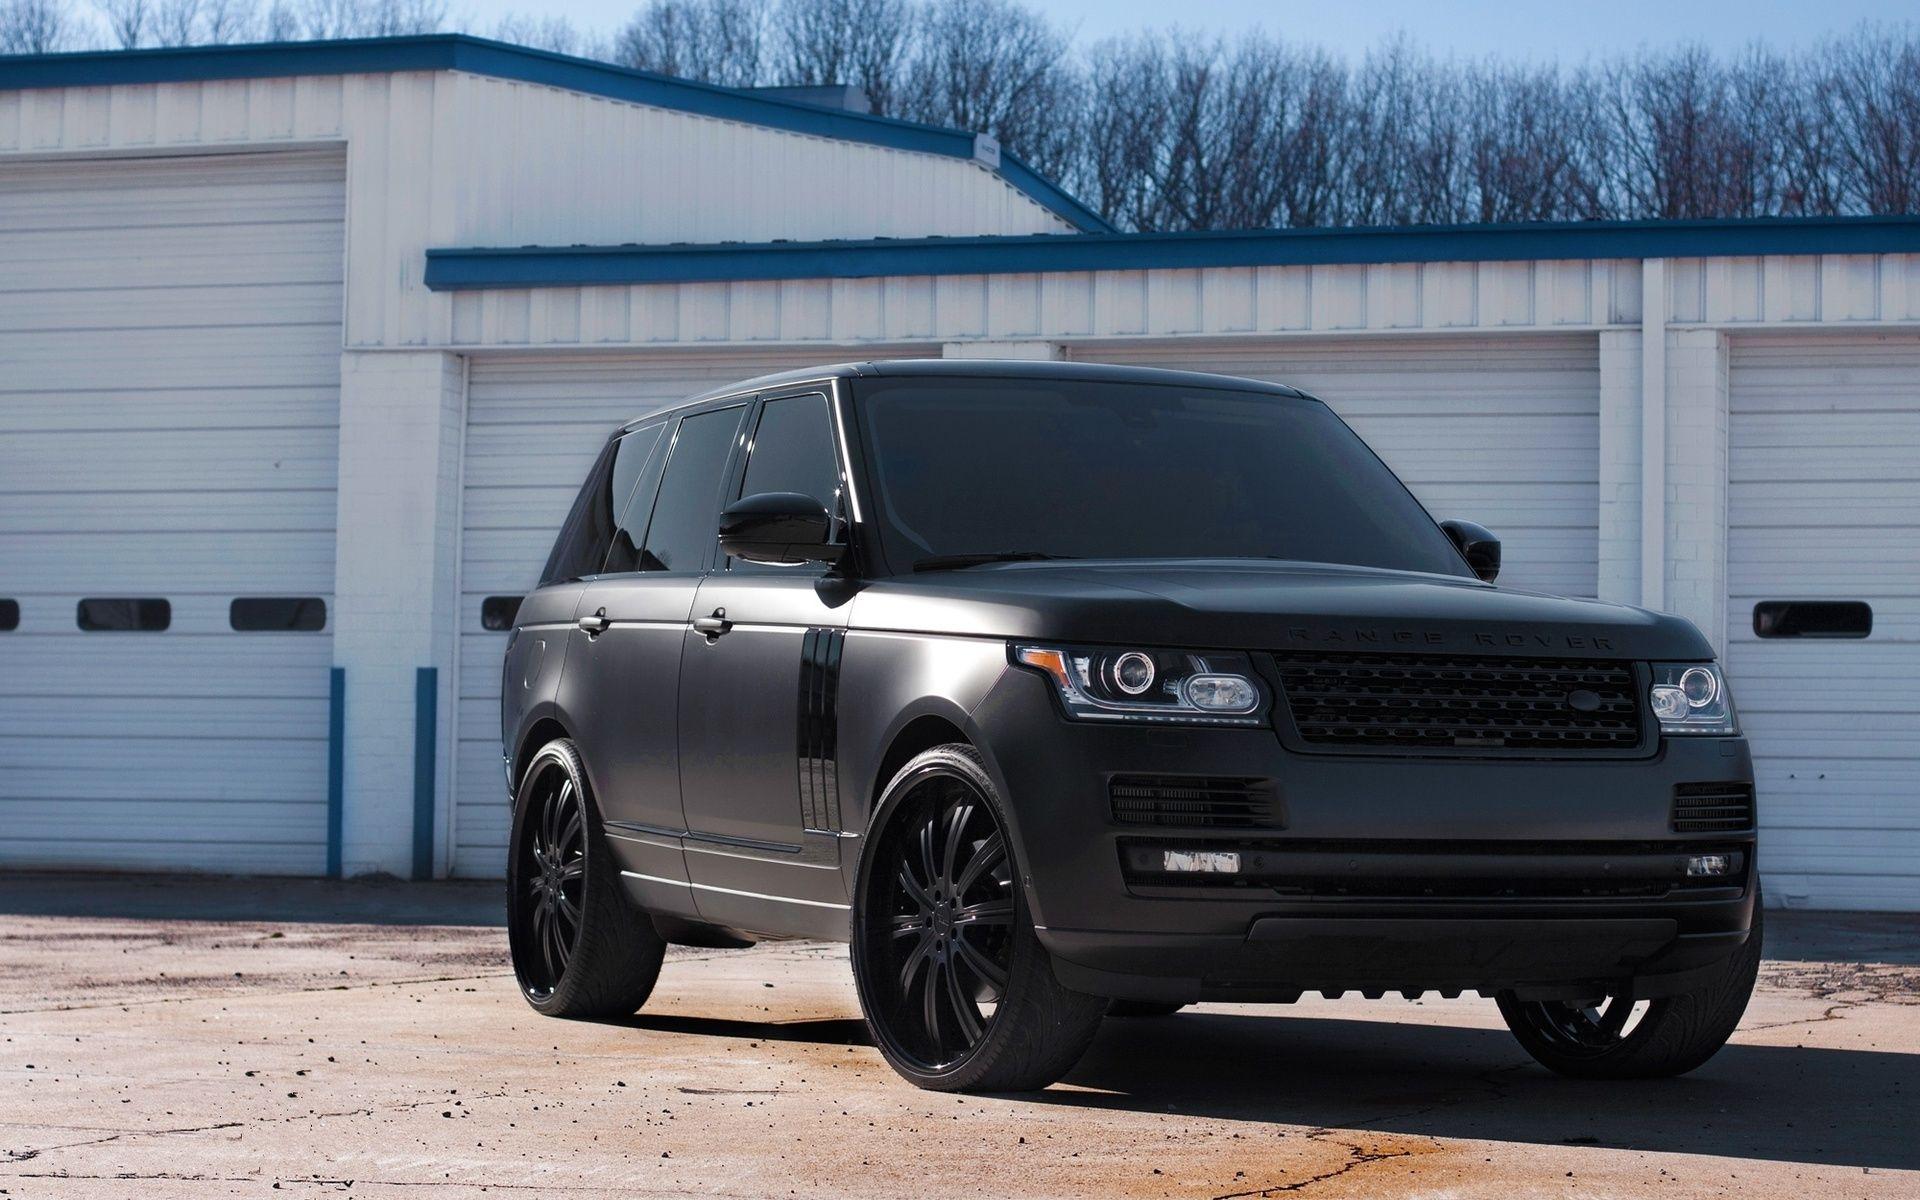 Range Rover Vogue Matte Black Range Rover Range Rover Black Land Rover